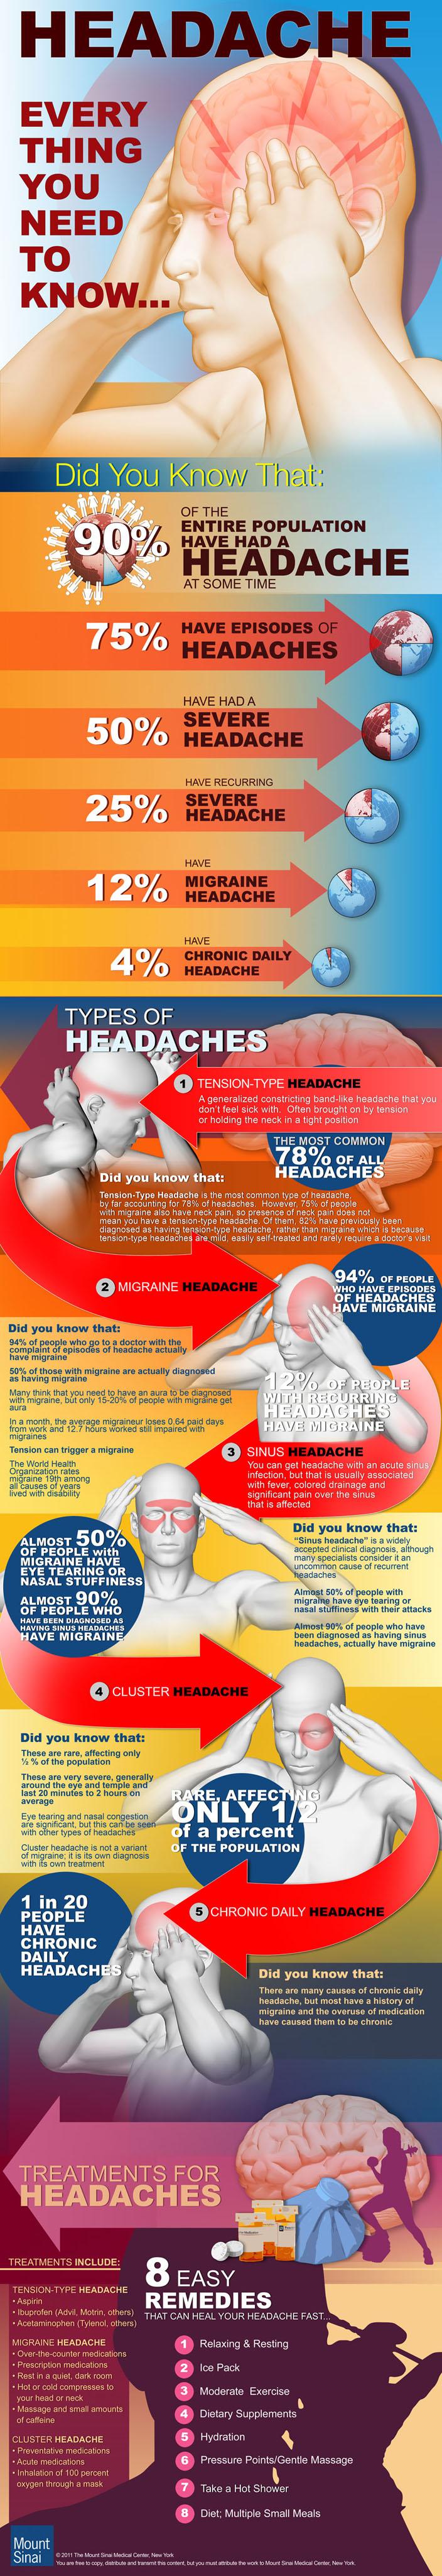 HEADACHE.Infographic704